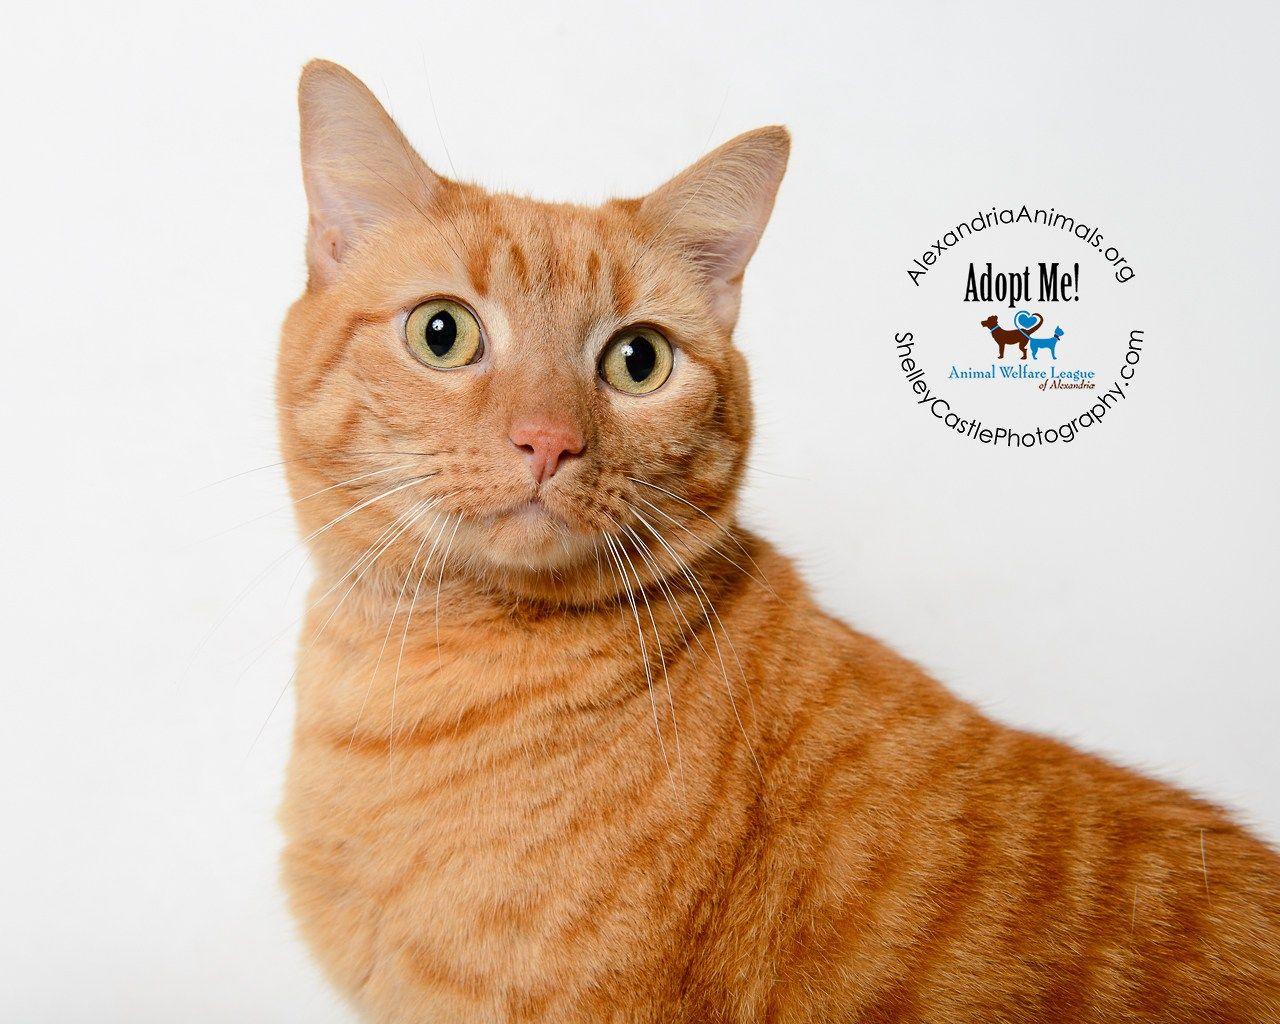 ADOPTED! Benny Animal Welfare League of Alexandria ACR